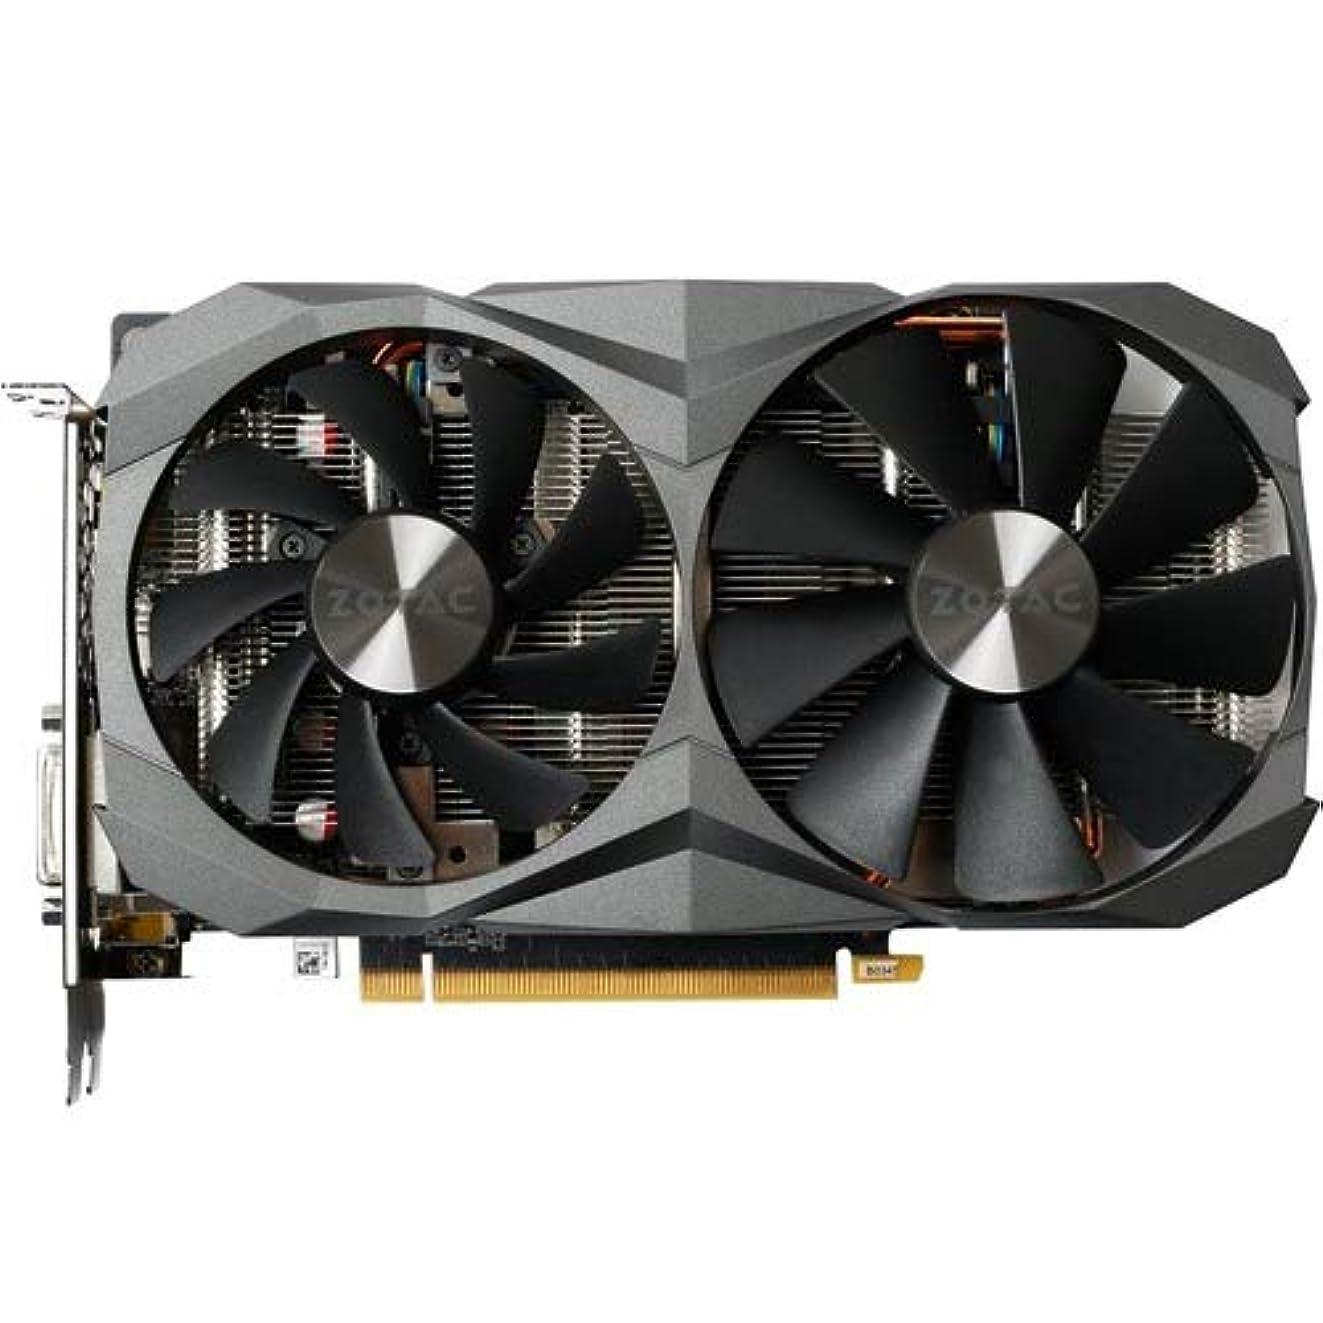 ZOTAC GeForce GTX 1060 DirectX 12 6GB 192-Bit GDDR5X PCI Express 3.0 HDCP Ready Video Card Model ZT-P10620A-10M